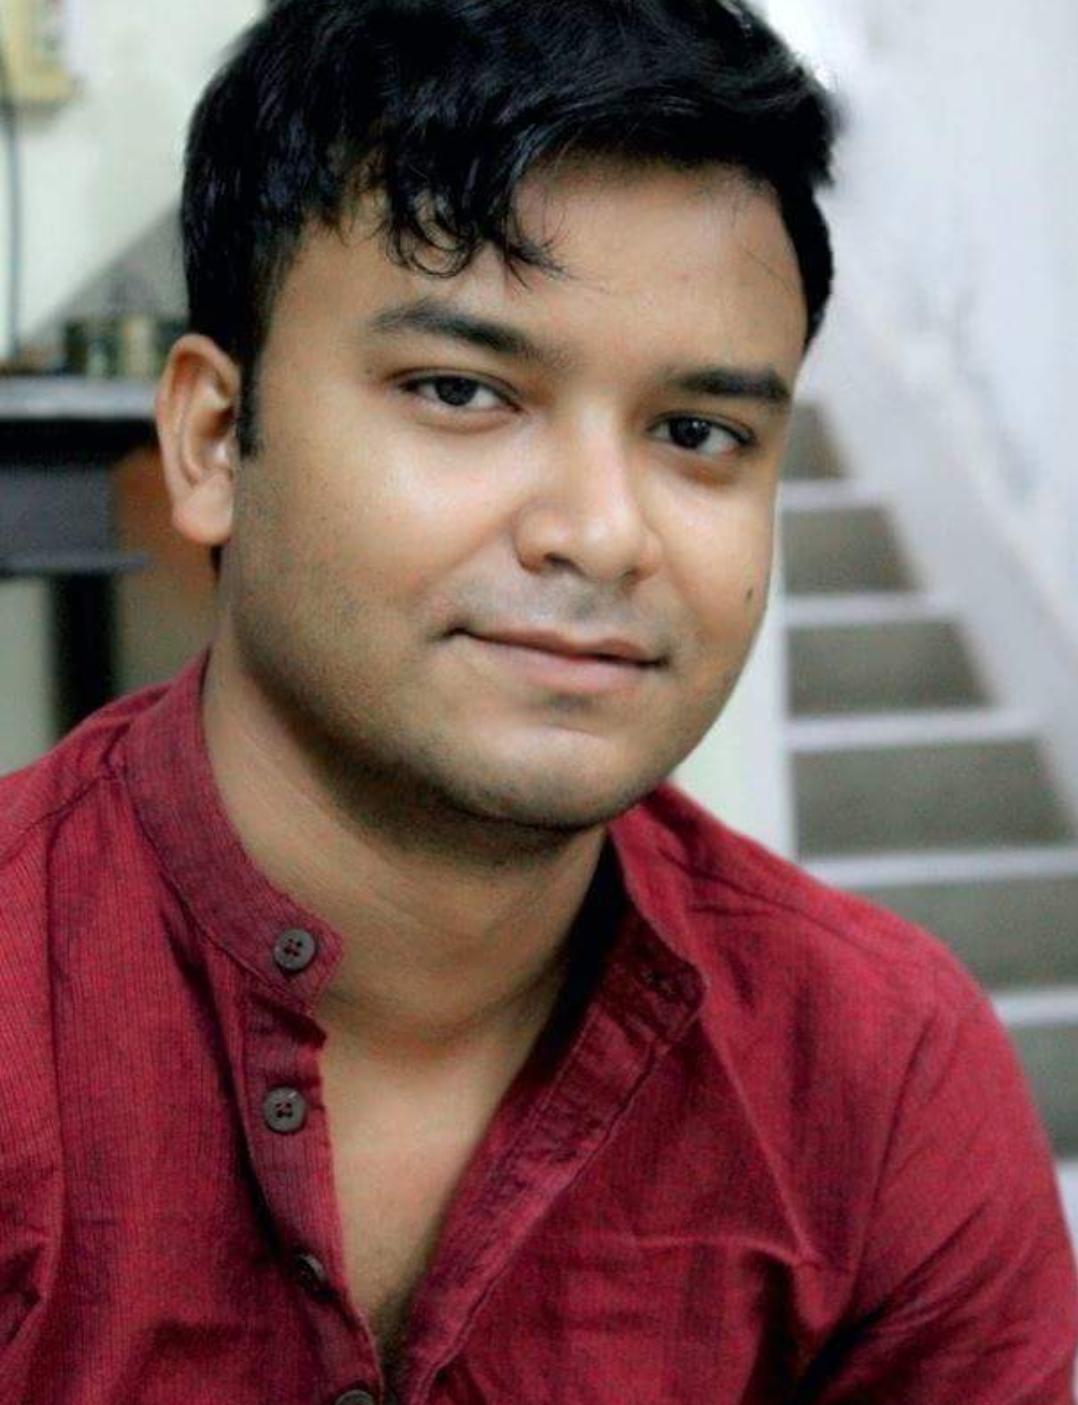 Koushik Hore Working Towards Colourful Beginnings For The Transgender Community In India